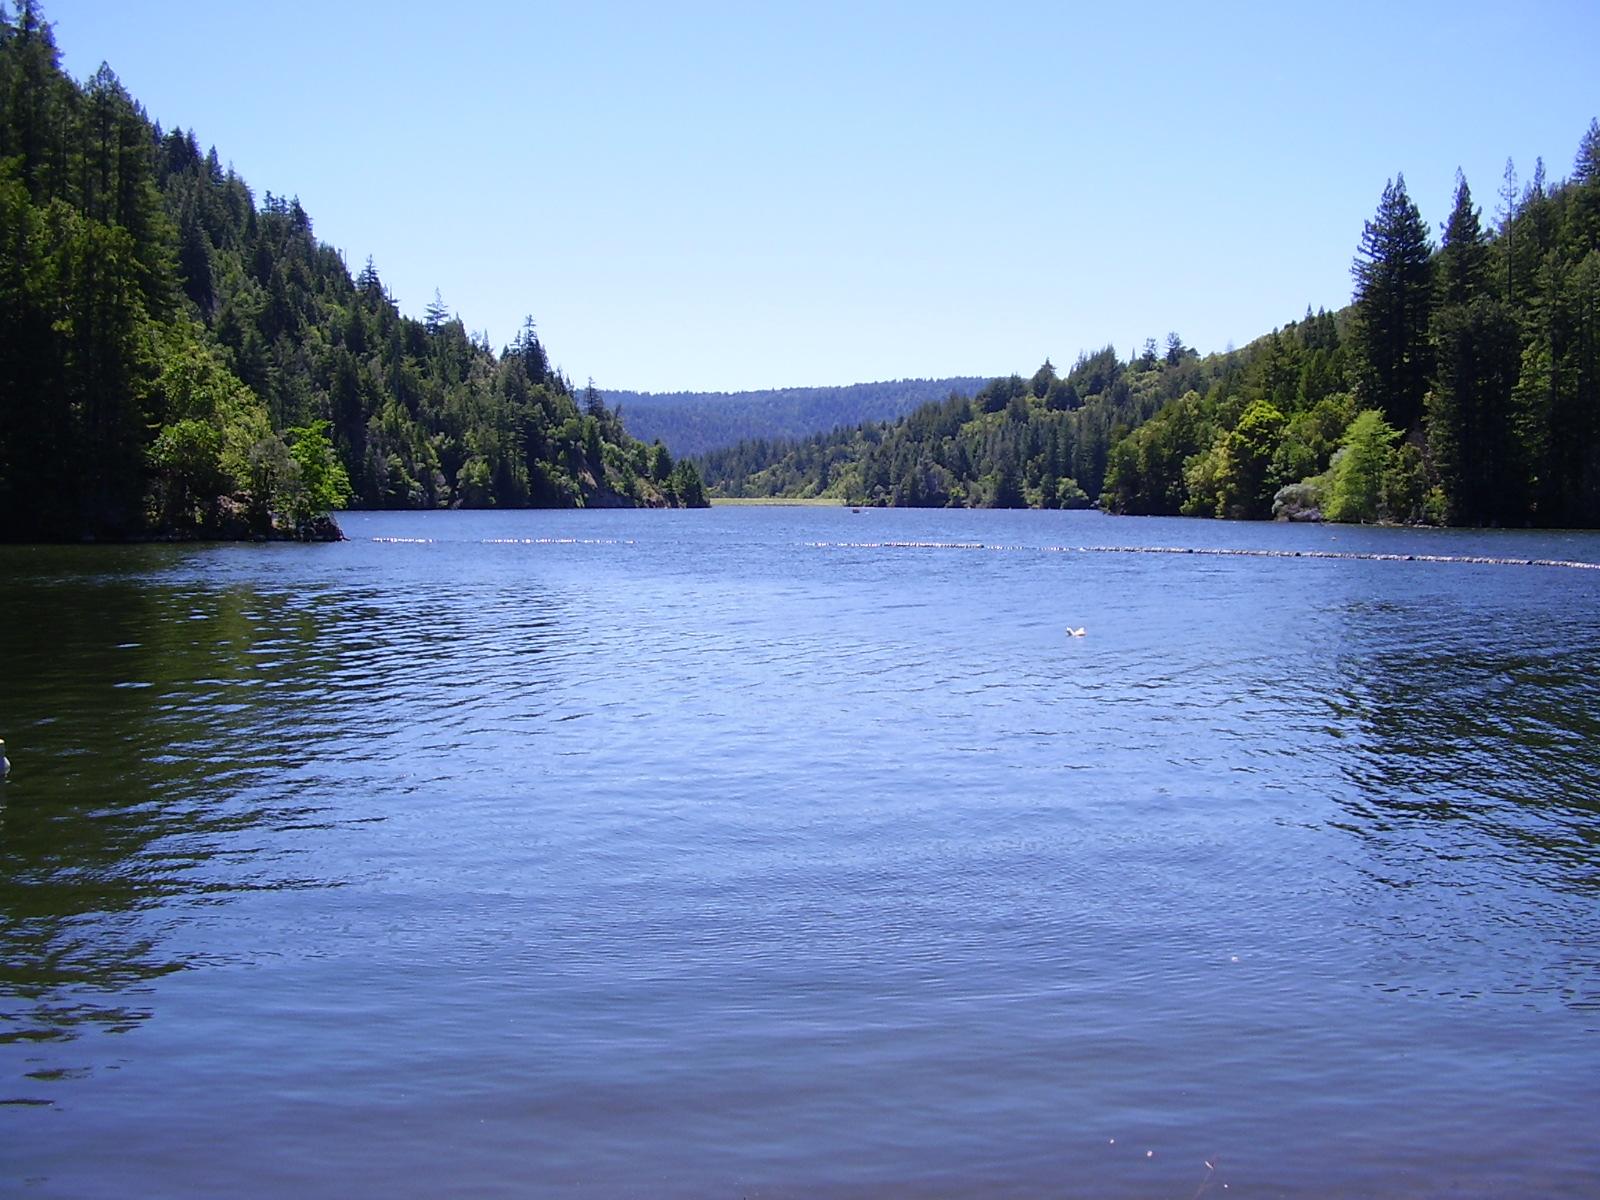 Loch lomond felton ca santa cruz county kristin leal for How much is a fishing license in california